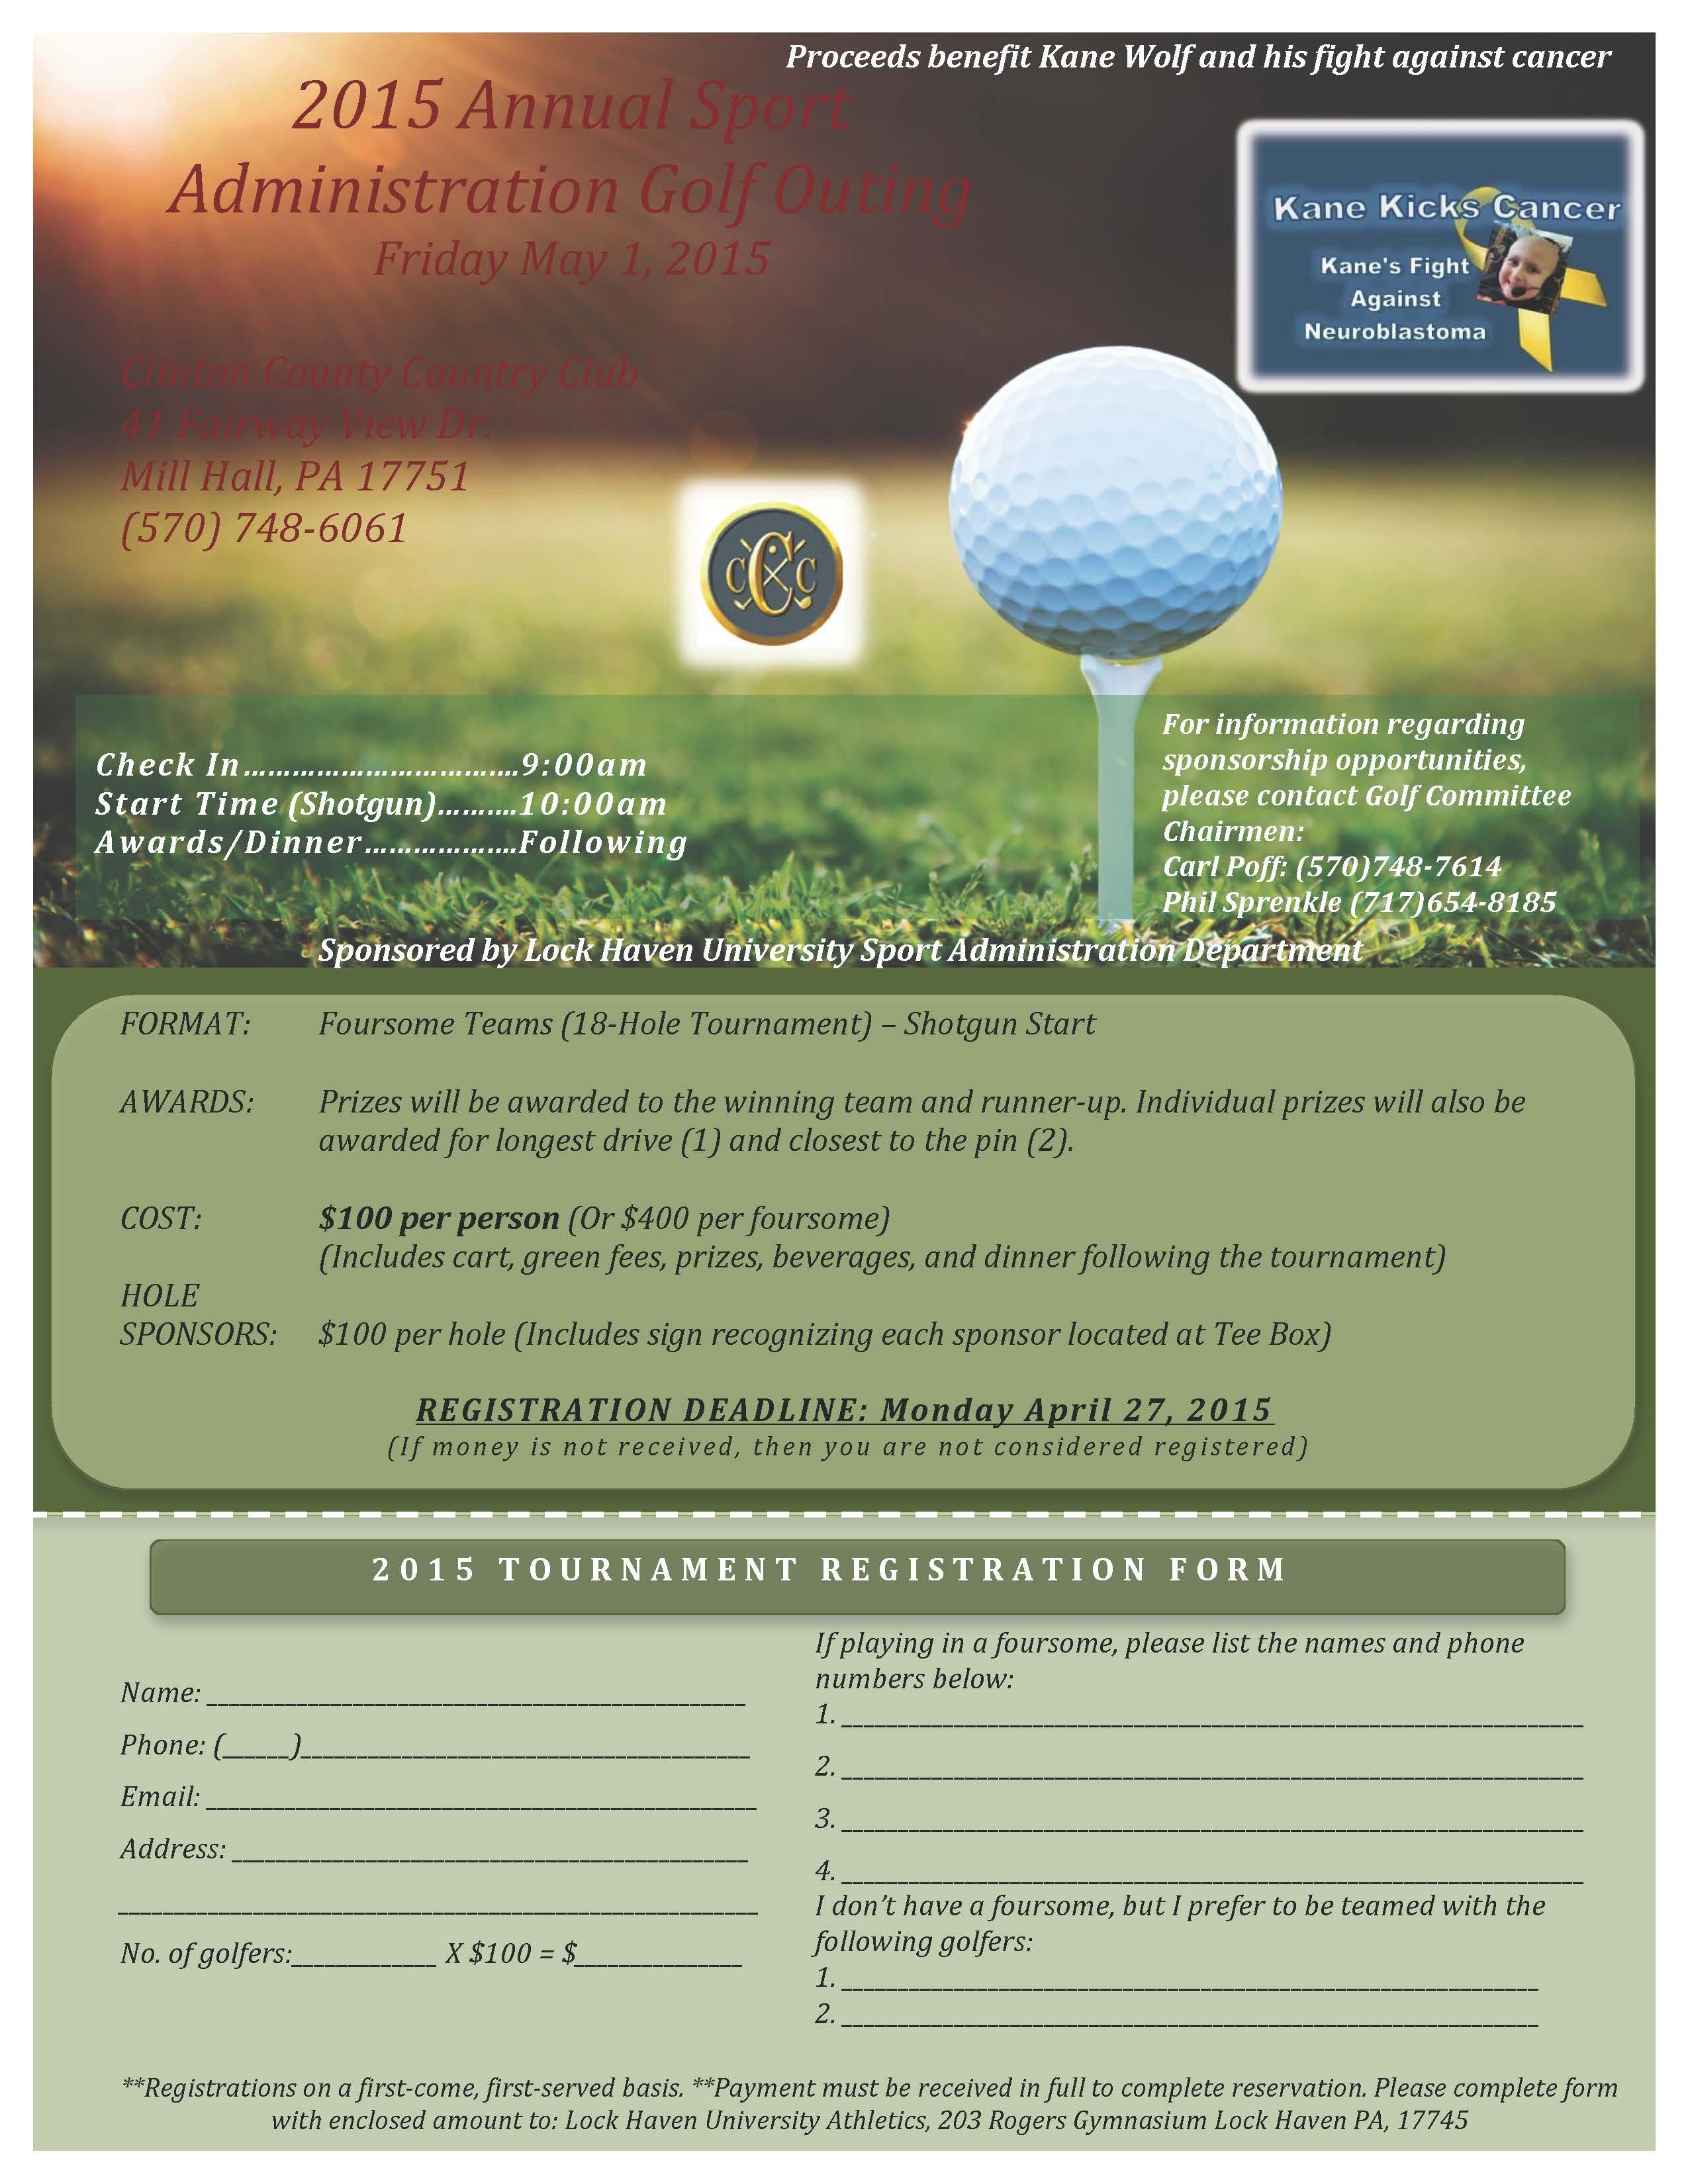 2015-Annual-Sport-Administratioin-Golf-Outing (1)